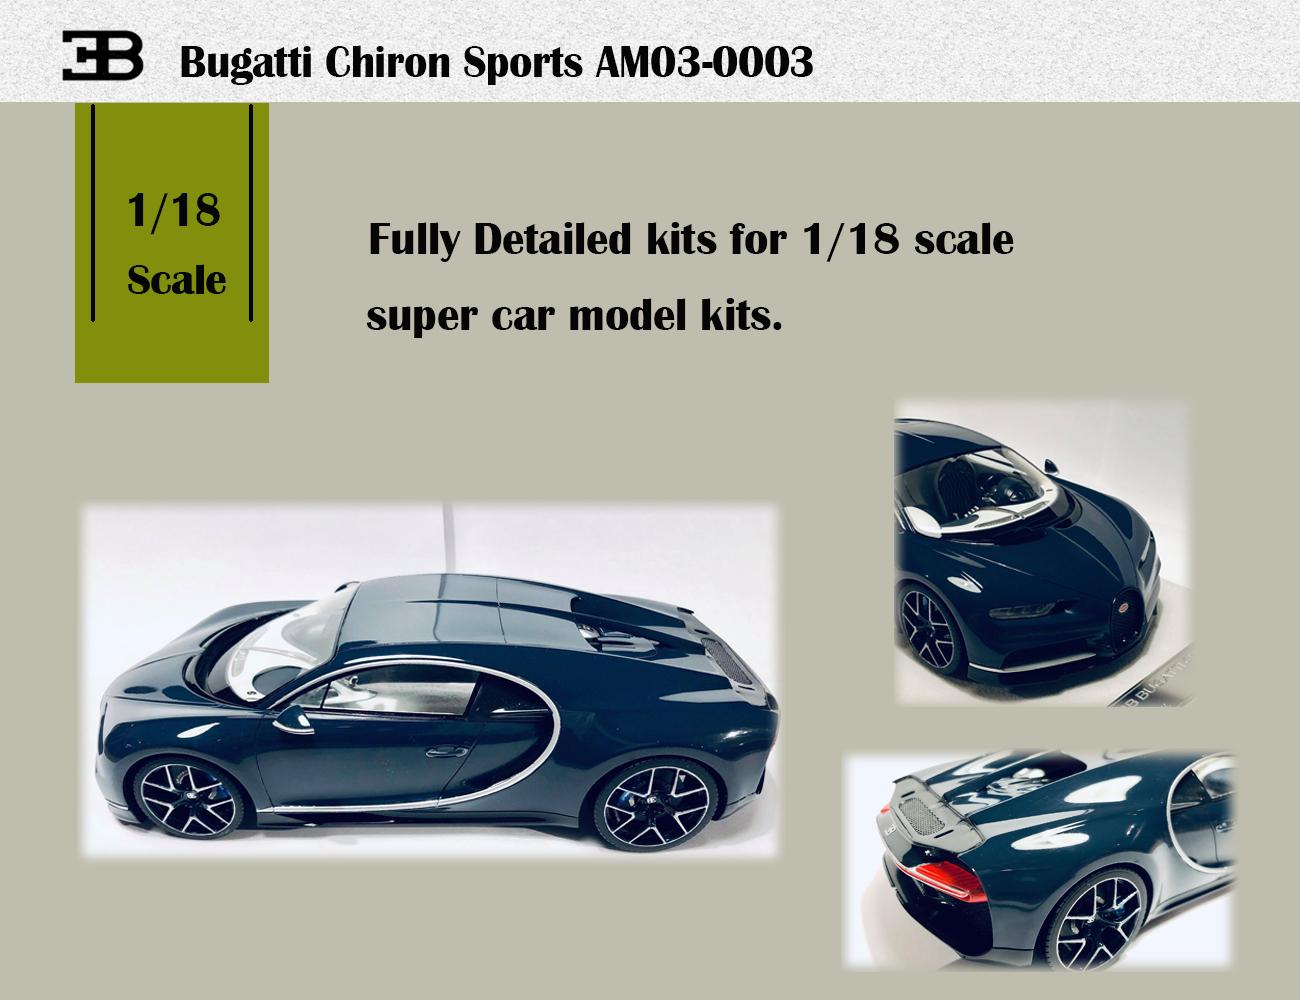 1/24 scale model car kits,1/24 model car kits,1/24 resin model car kits